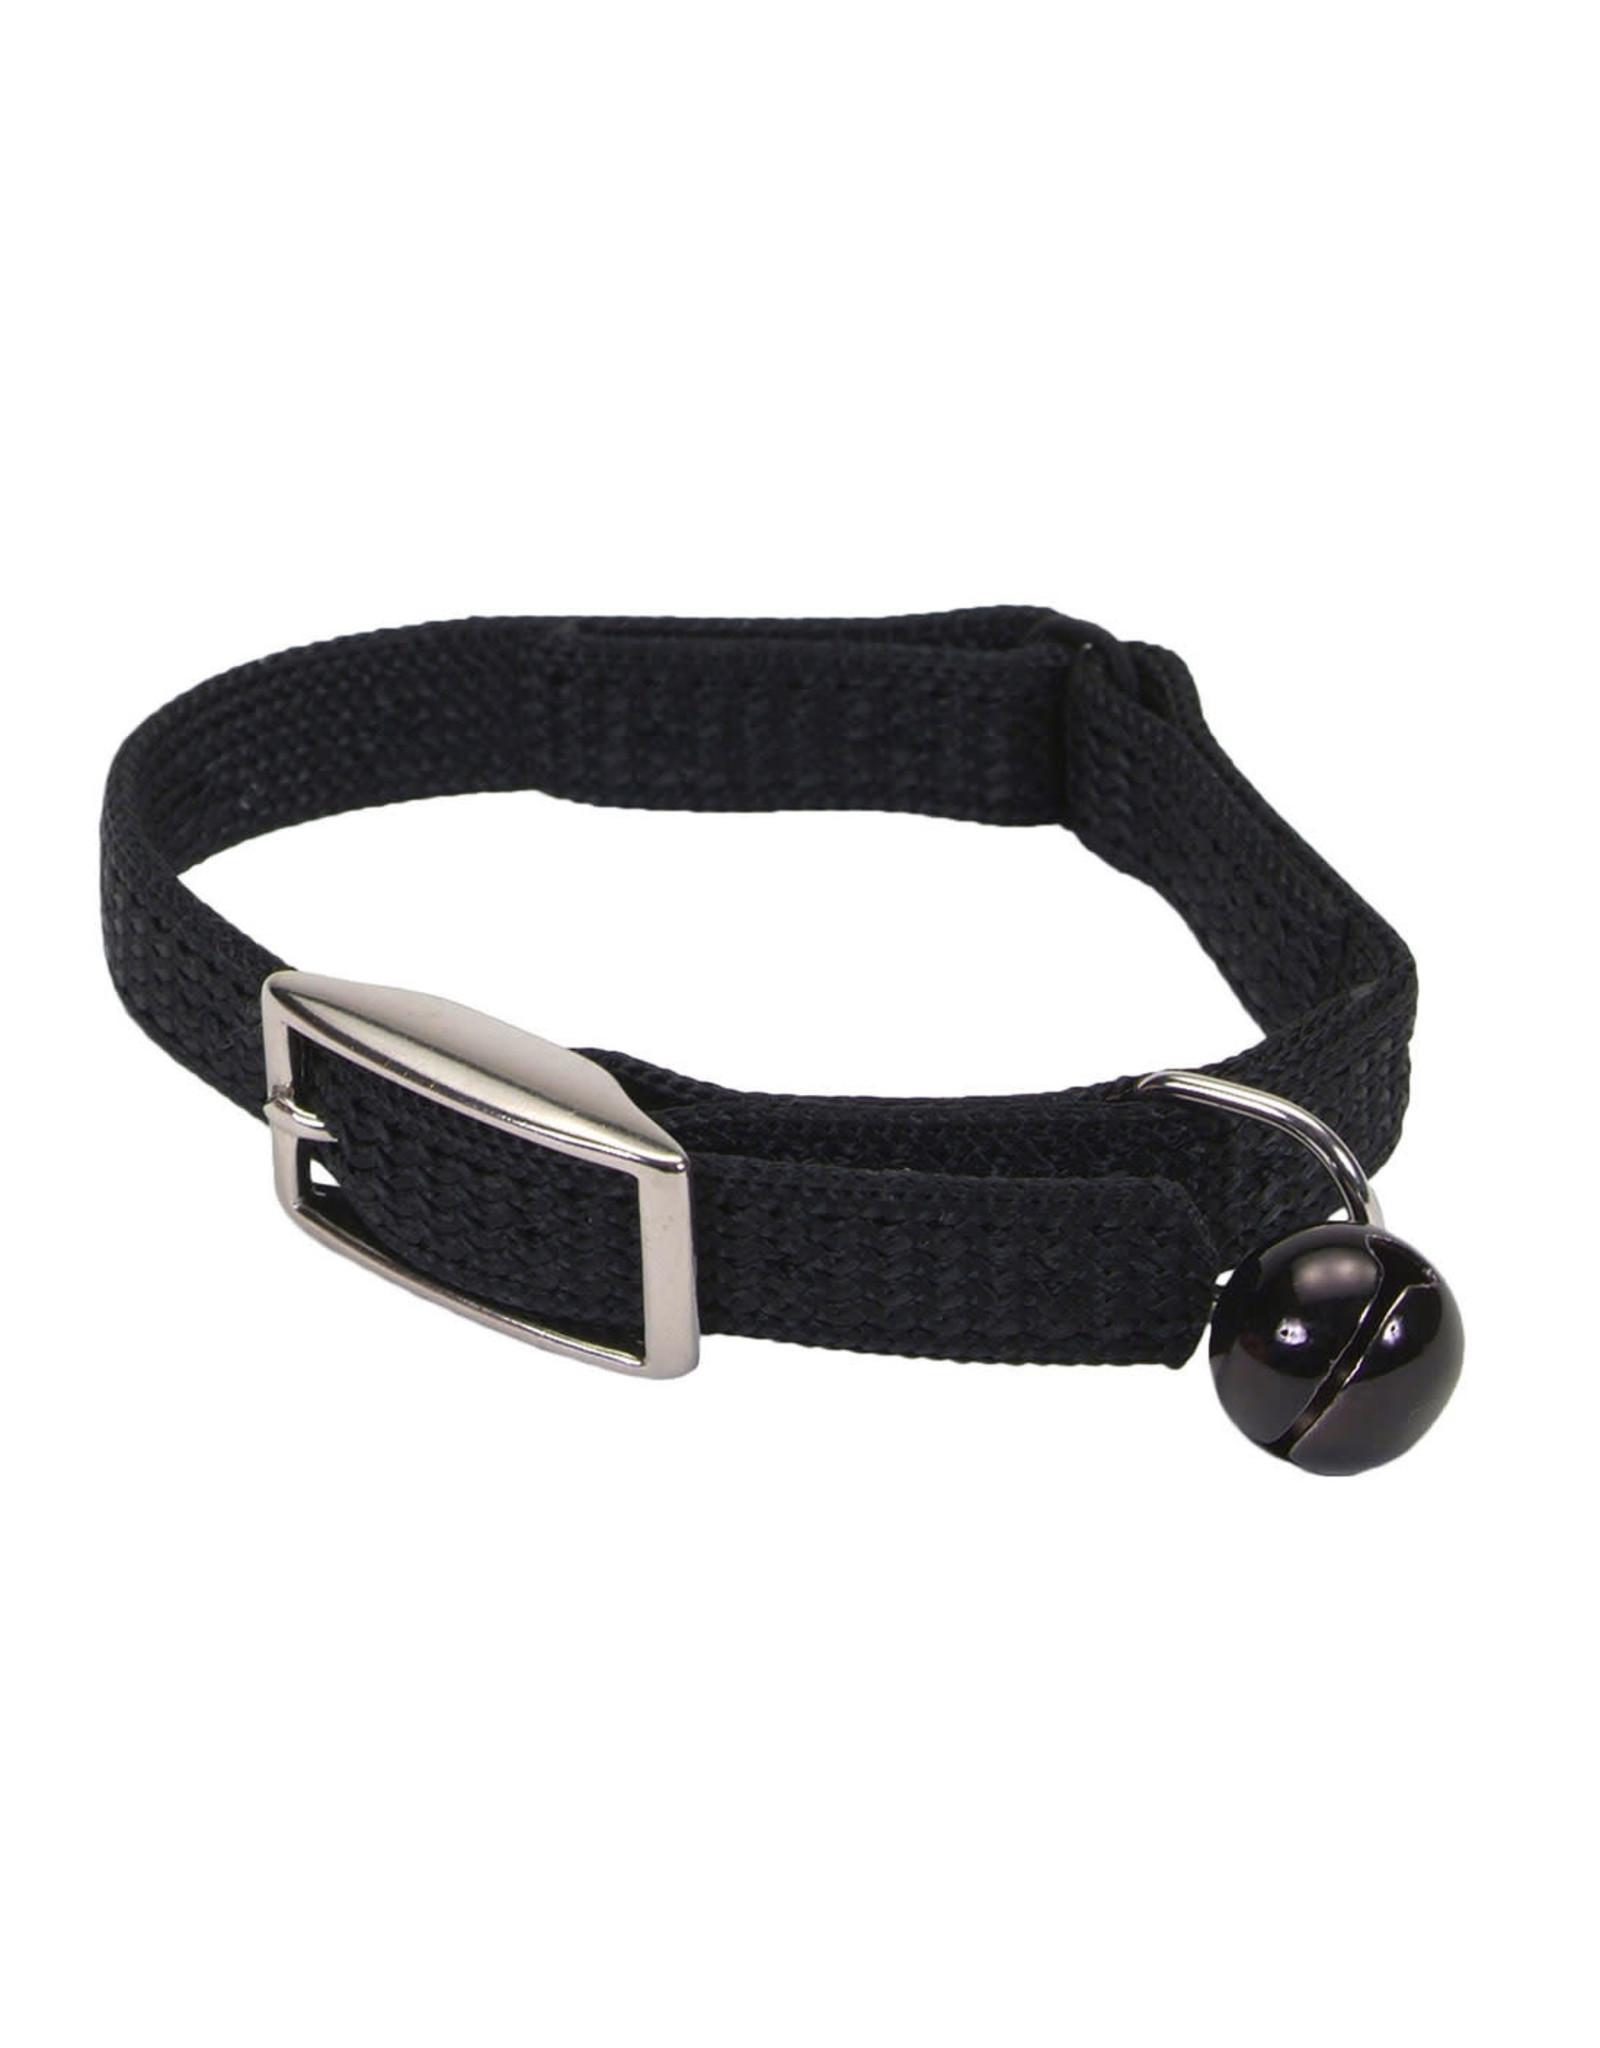 "Coastal Coastal Cat Safety Collar - 8"" Black"